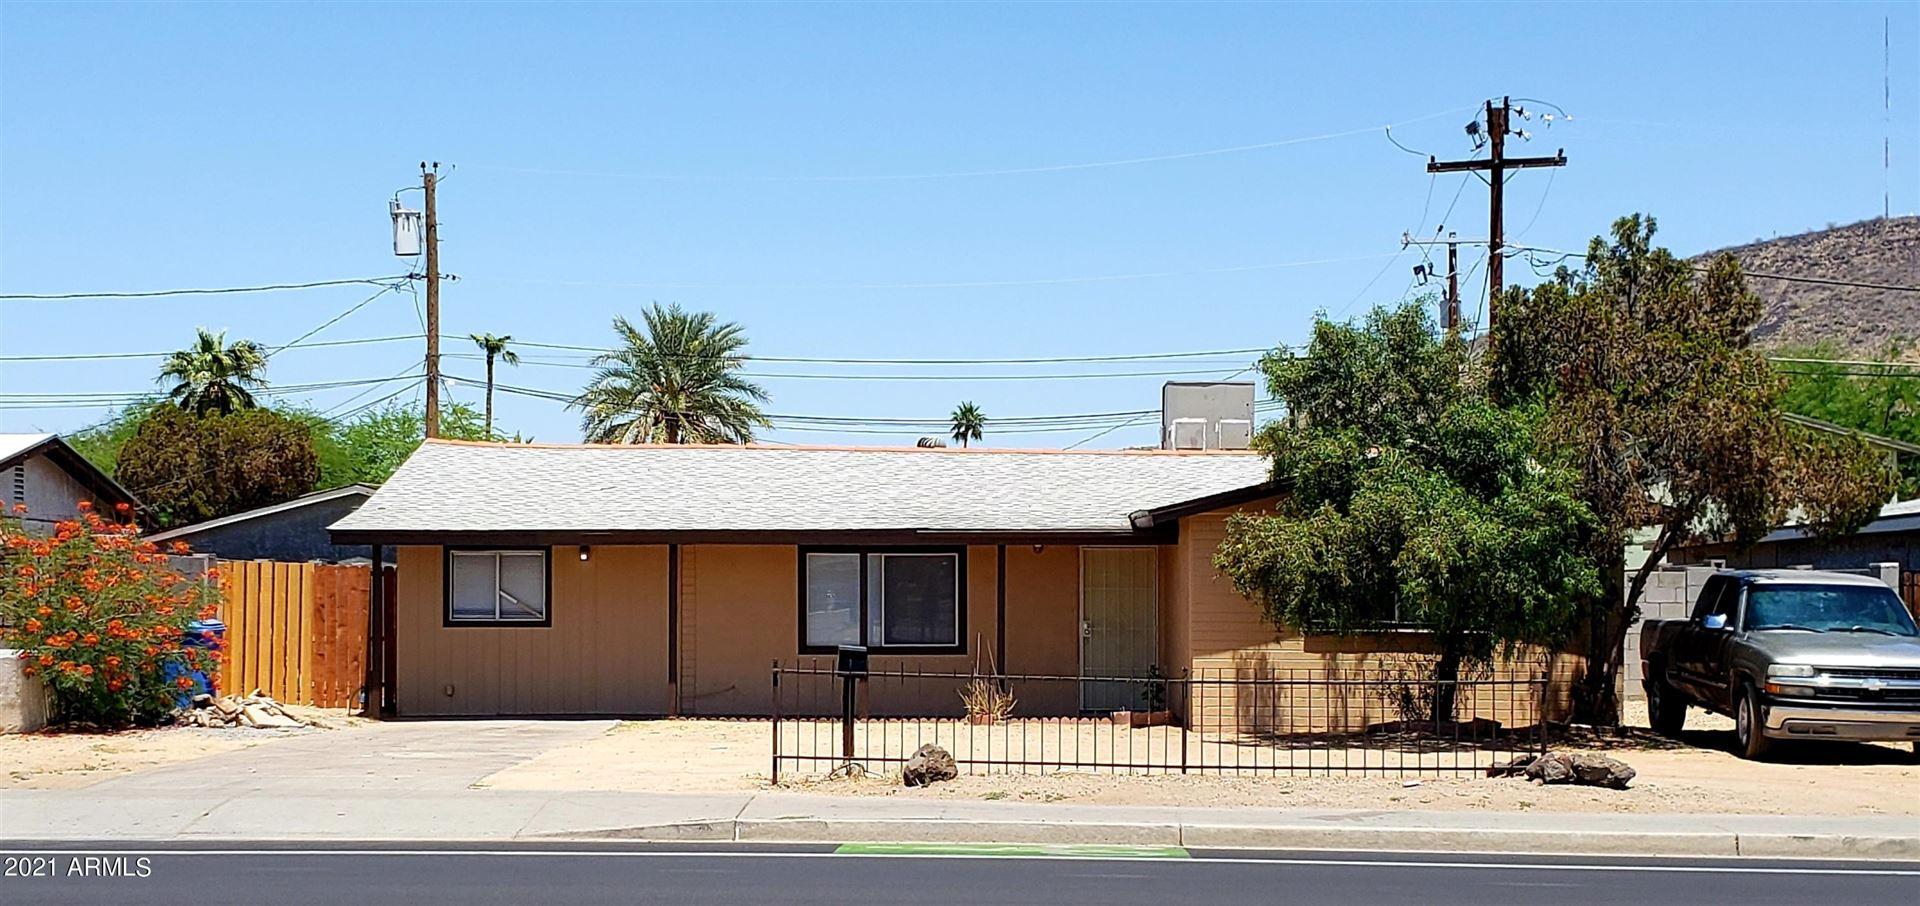 1812 W Peoria Avenue, Phoenix, AZ 85029 - MLS#: 6235630